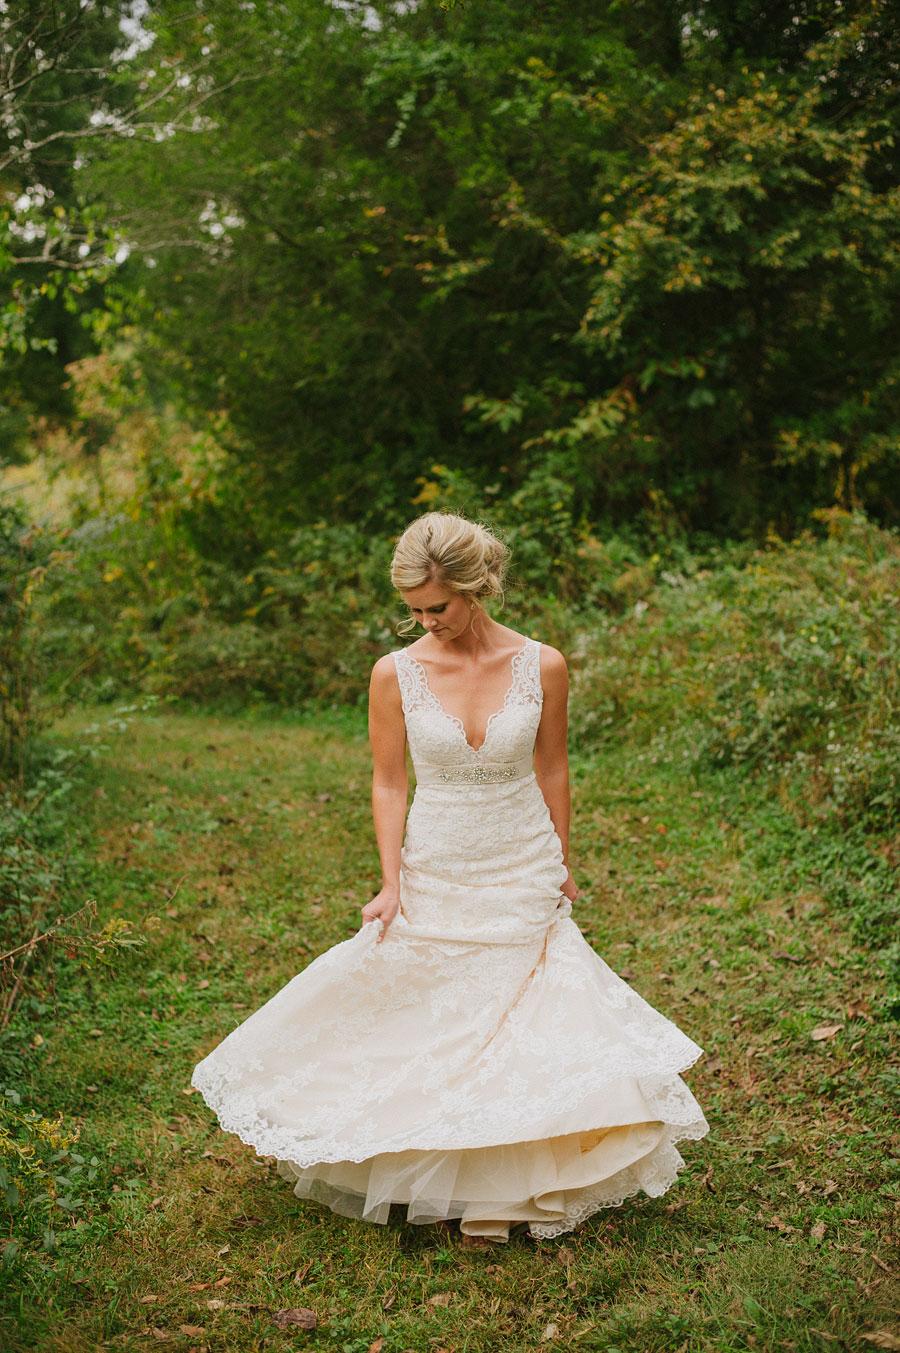 nashvillewedding_leipersforkwedding_farmwedding_bytheimageisfound_0058.jpg